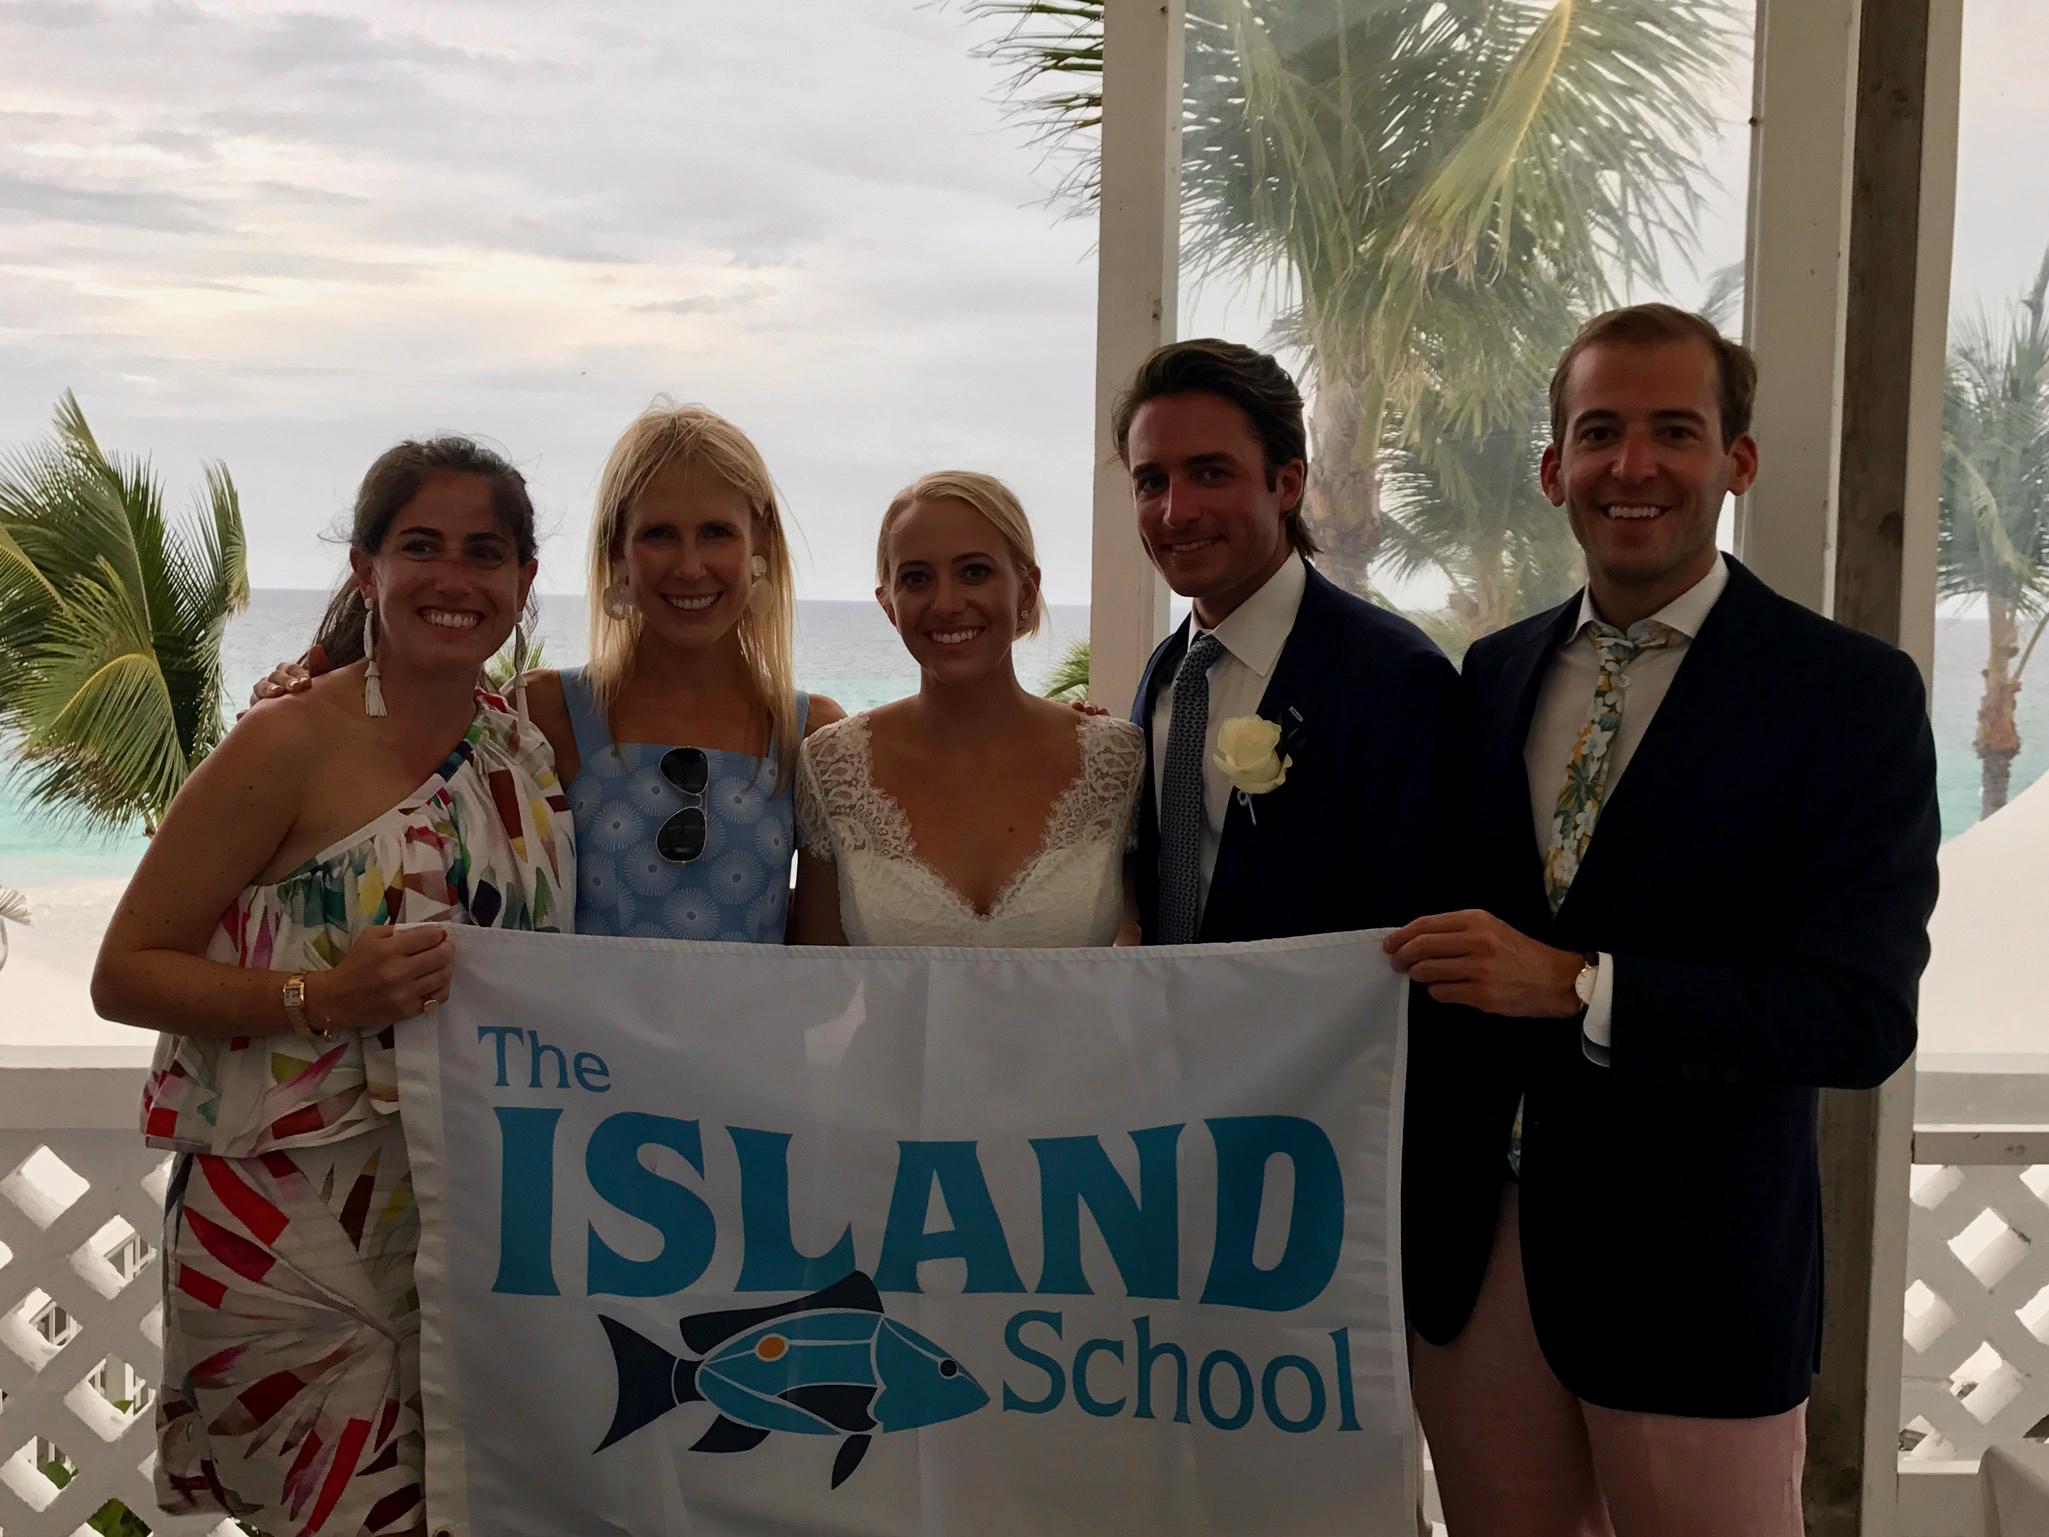 Lizzie Horvitz (SP'04), Hillary Keefe (SP'04), Hillary Bunn (SP'04), Andrew Gough (SP'04), and Patrick DiLoreto (F'04) celebrating Hillary Bunn's wedding on Harbor Island, Eleuthera.